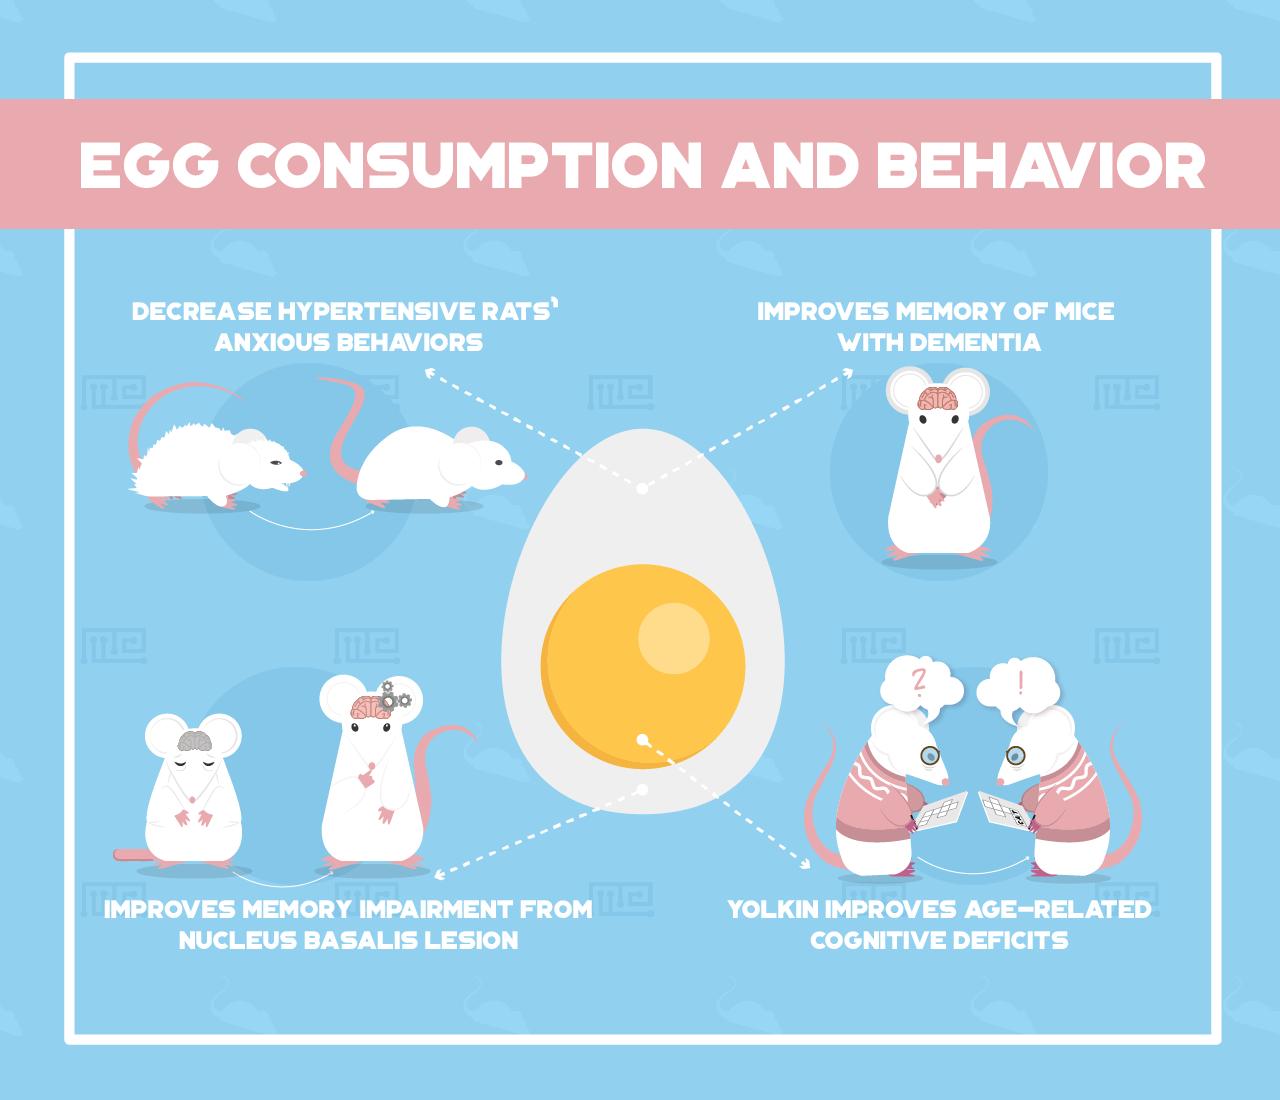 Egg-Consumption-and-Behavior